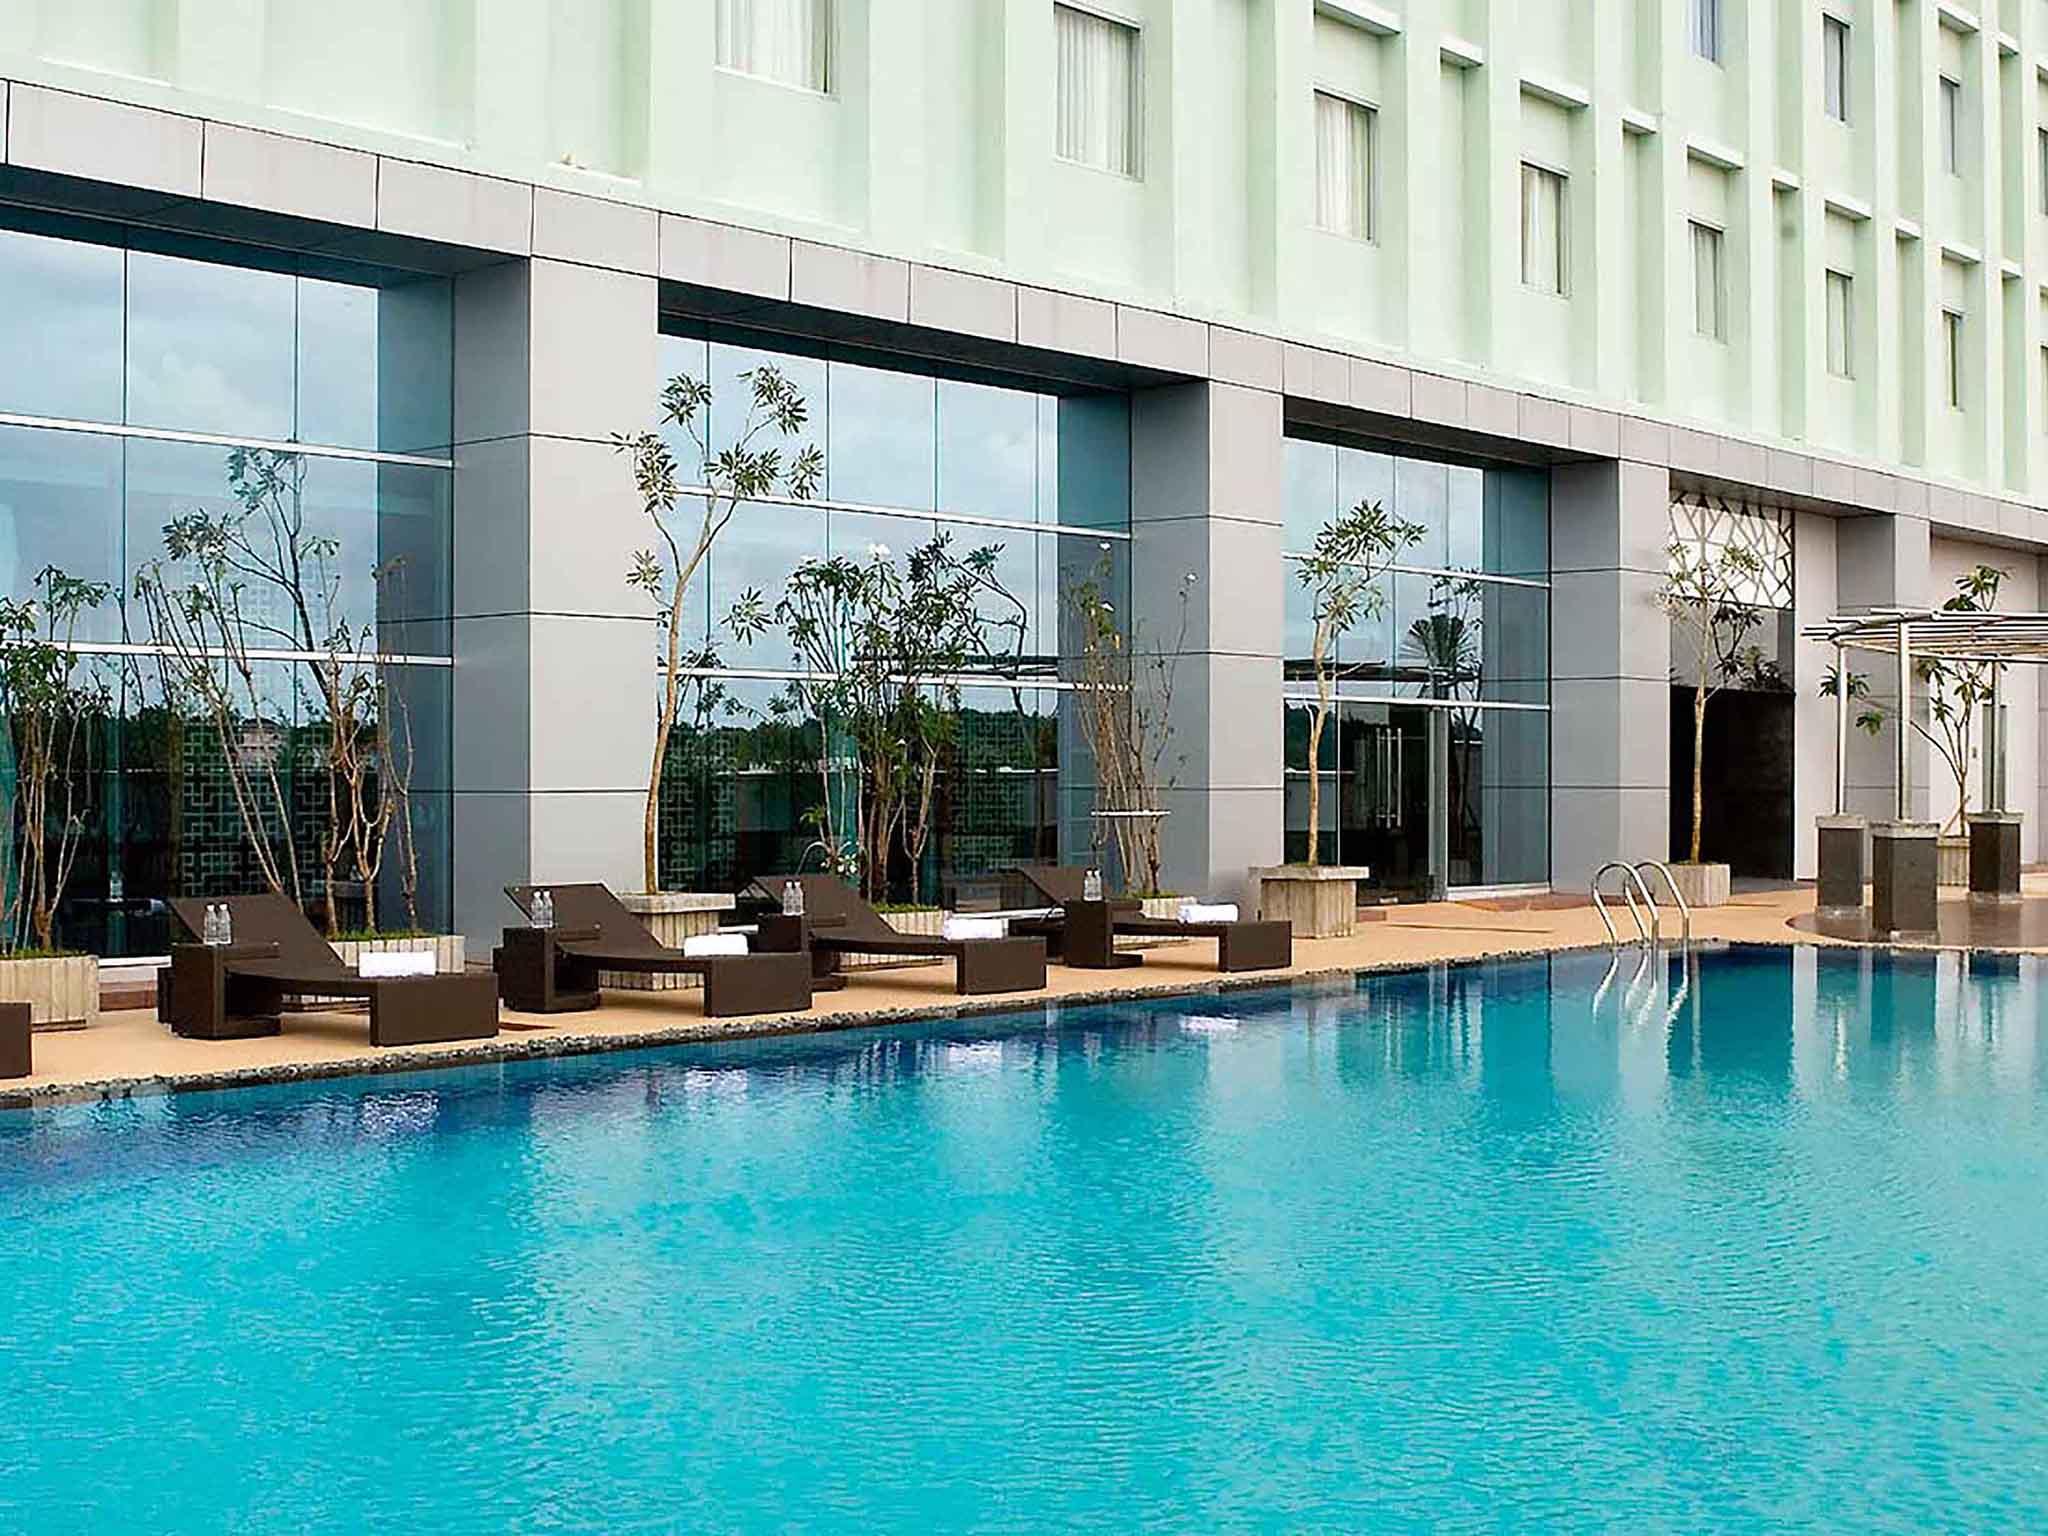 Novotel Bangka Hotel and Convention Center